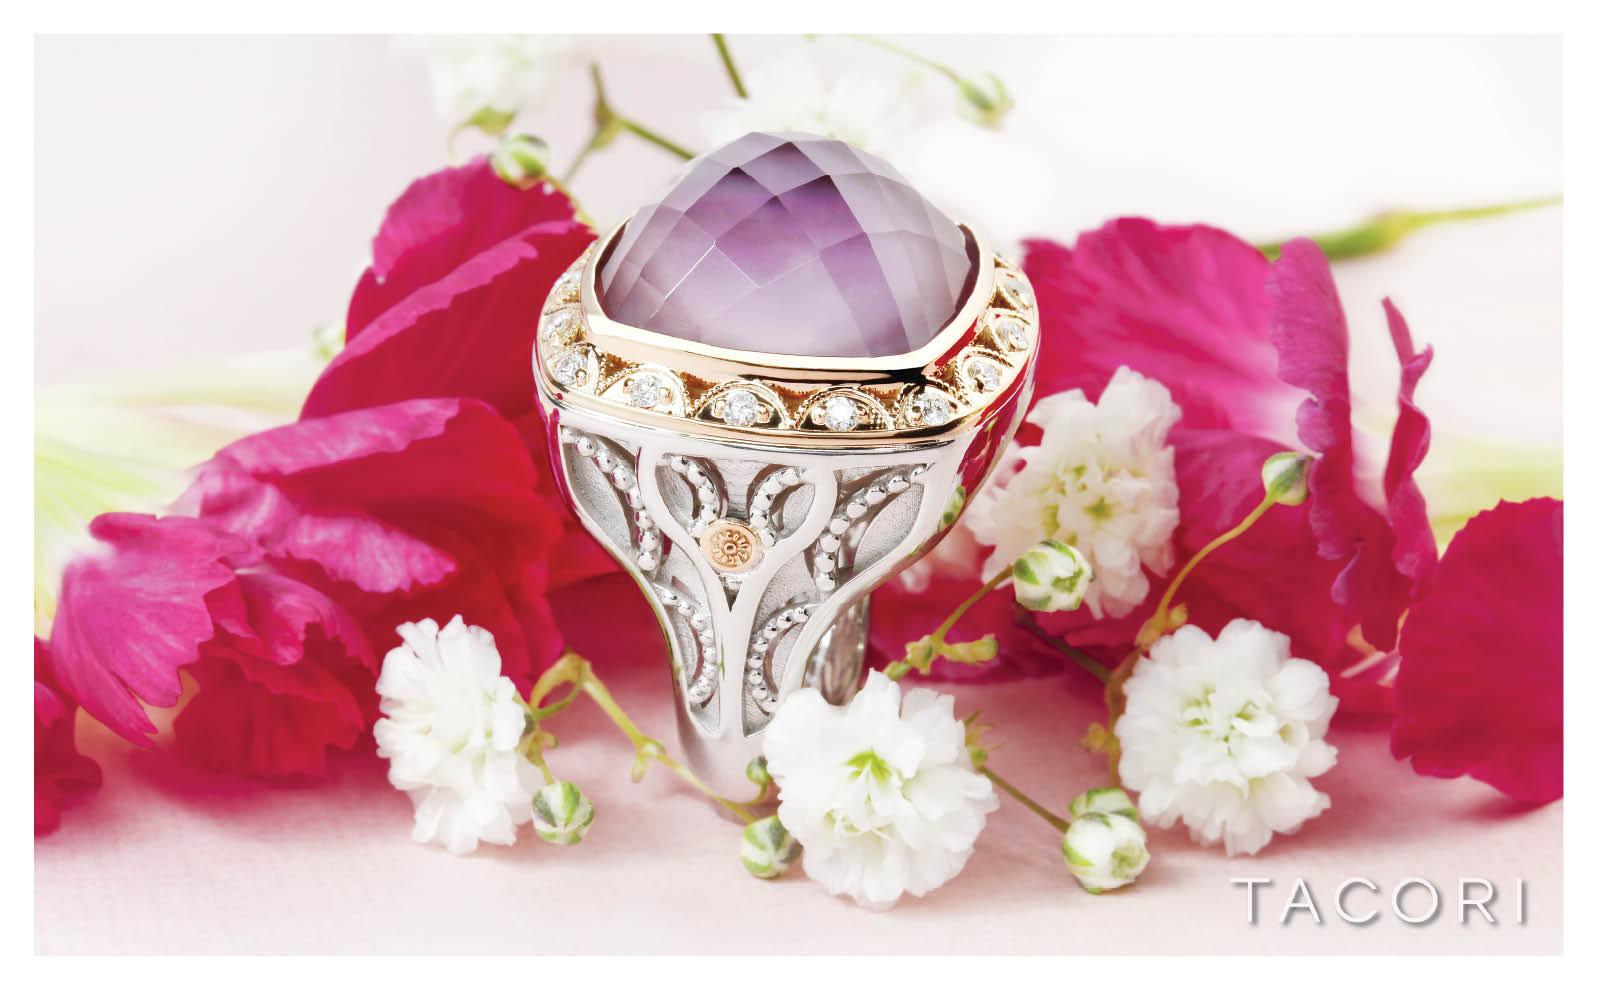 Tacori Jewelry 2015 Jewelry Calendar Whiteflash